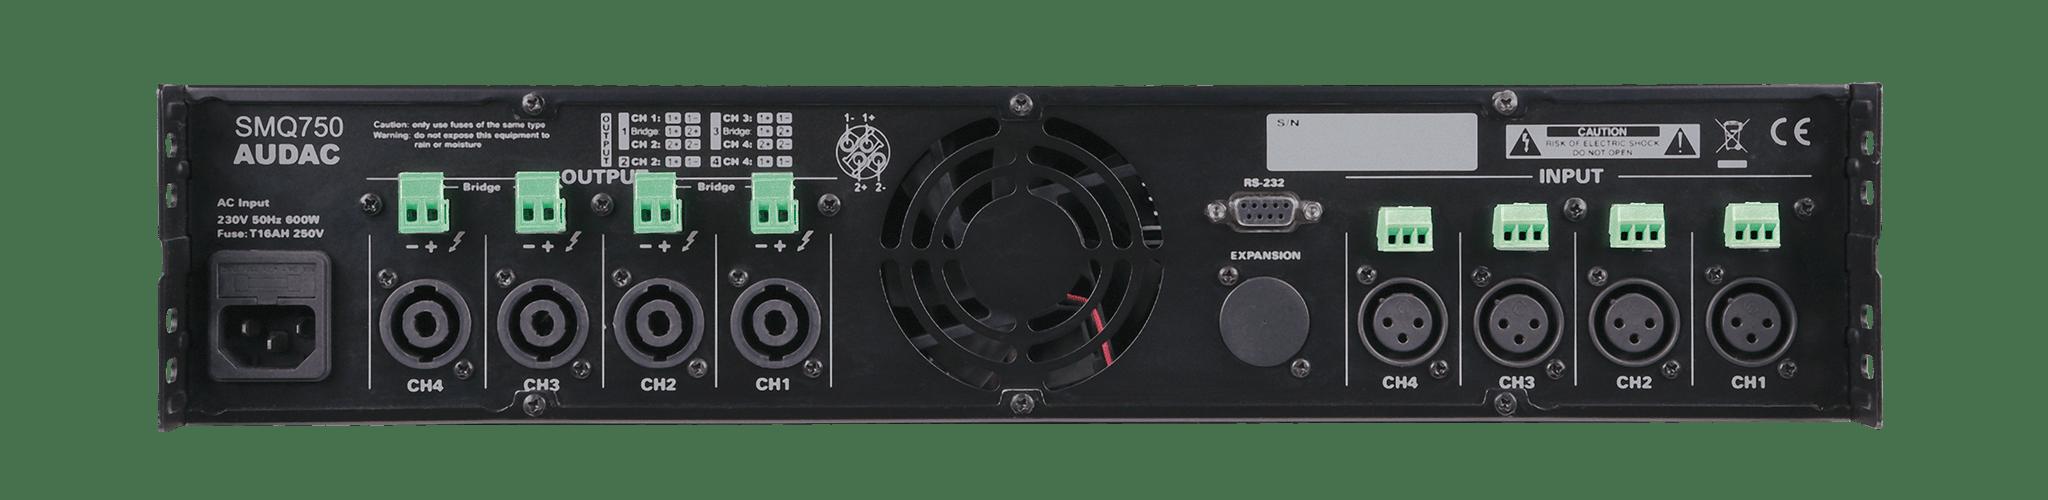 SMQ750 - WaveDynamics™ quad-channel power amplifier 4 x 750W